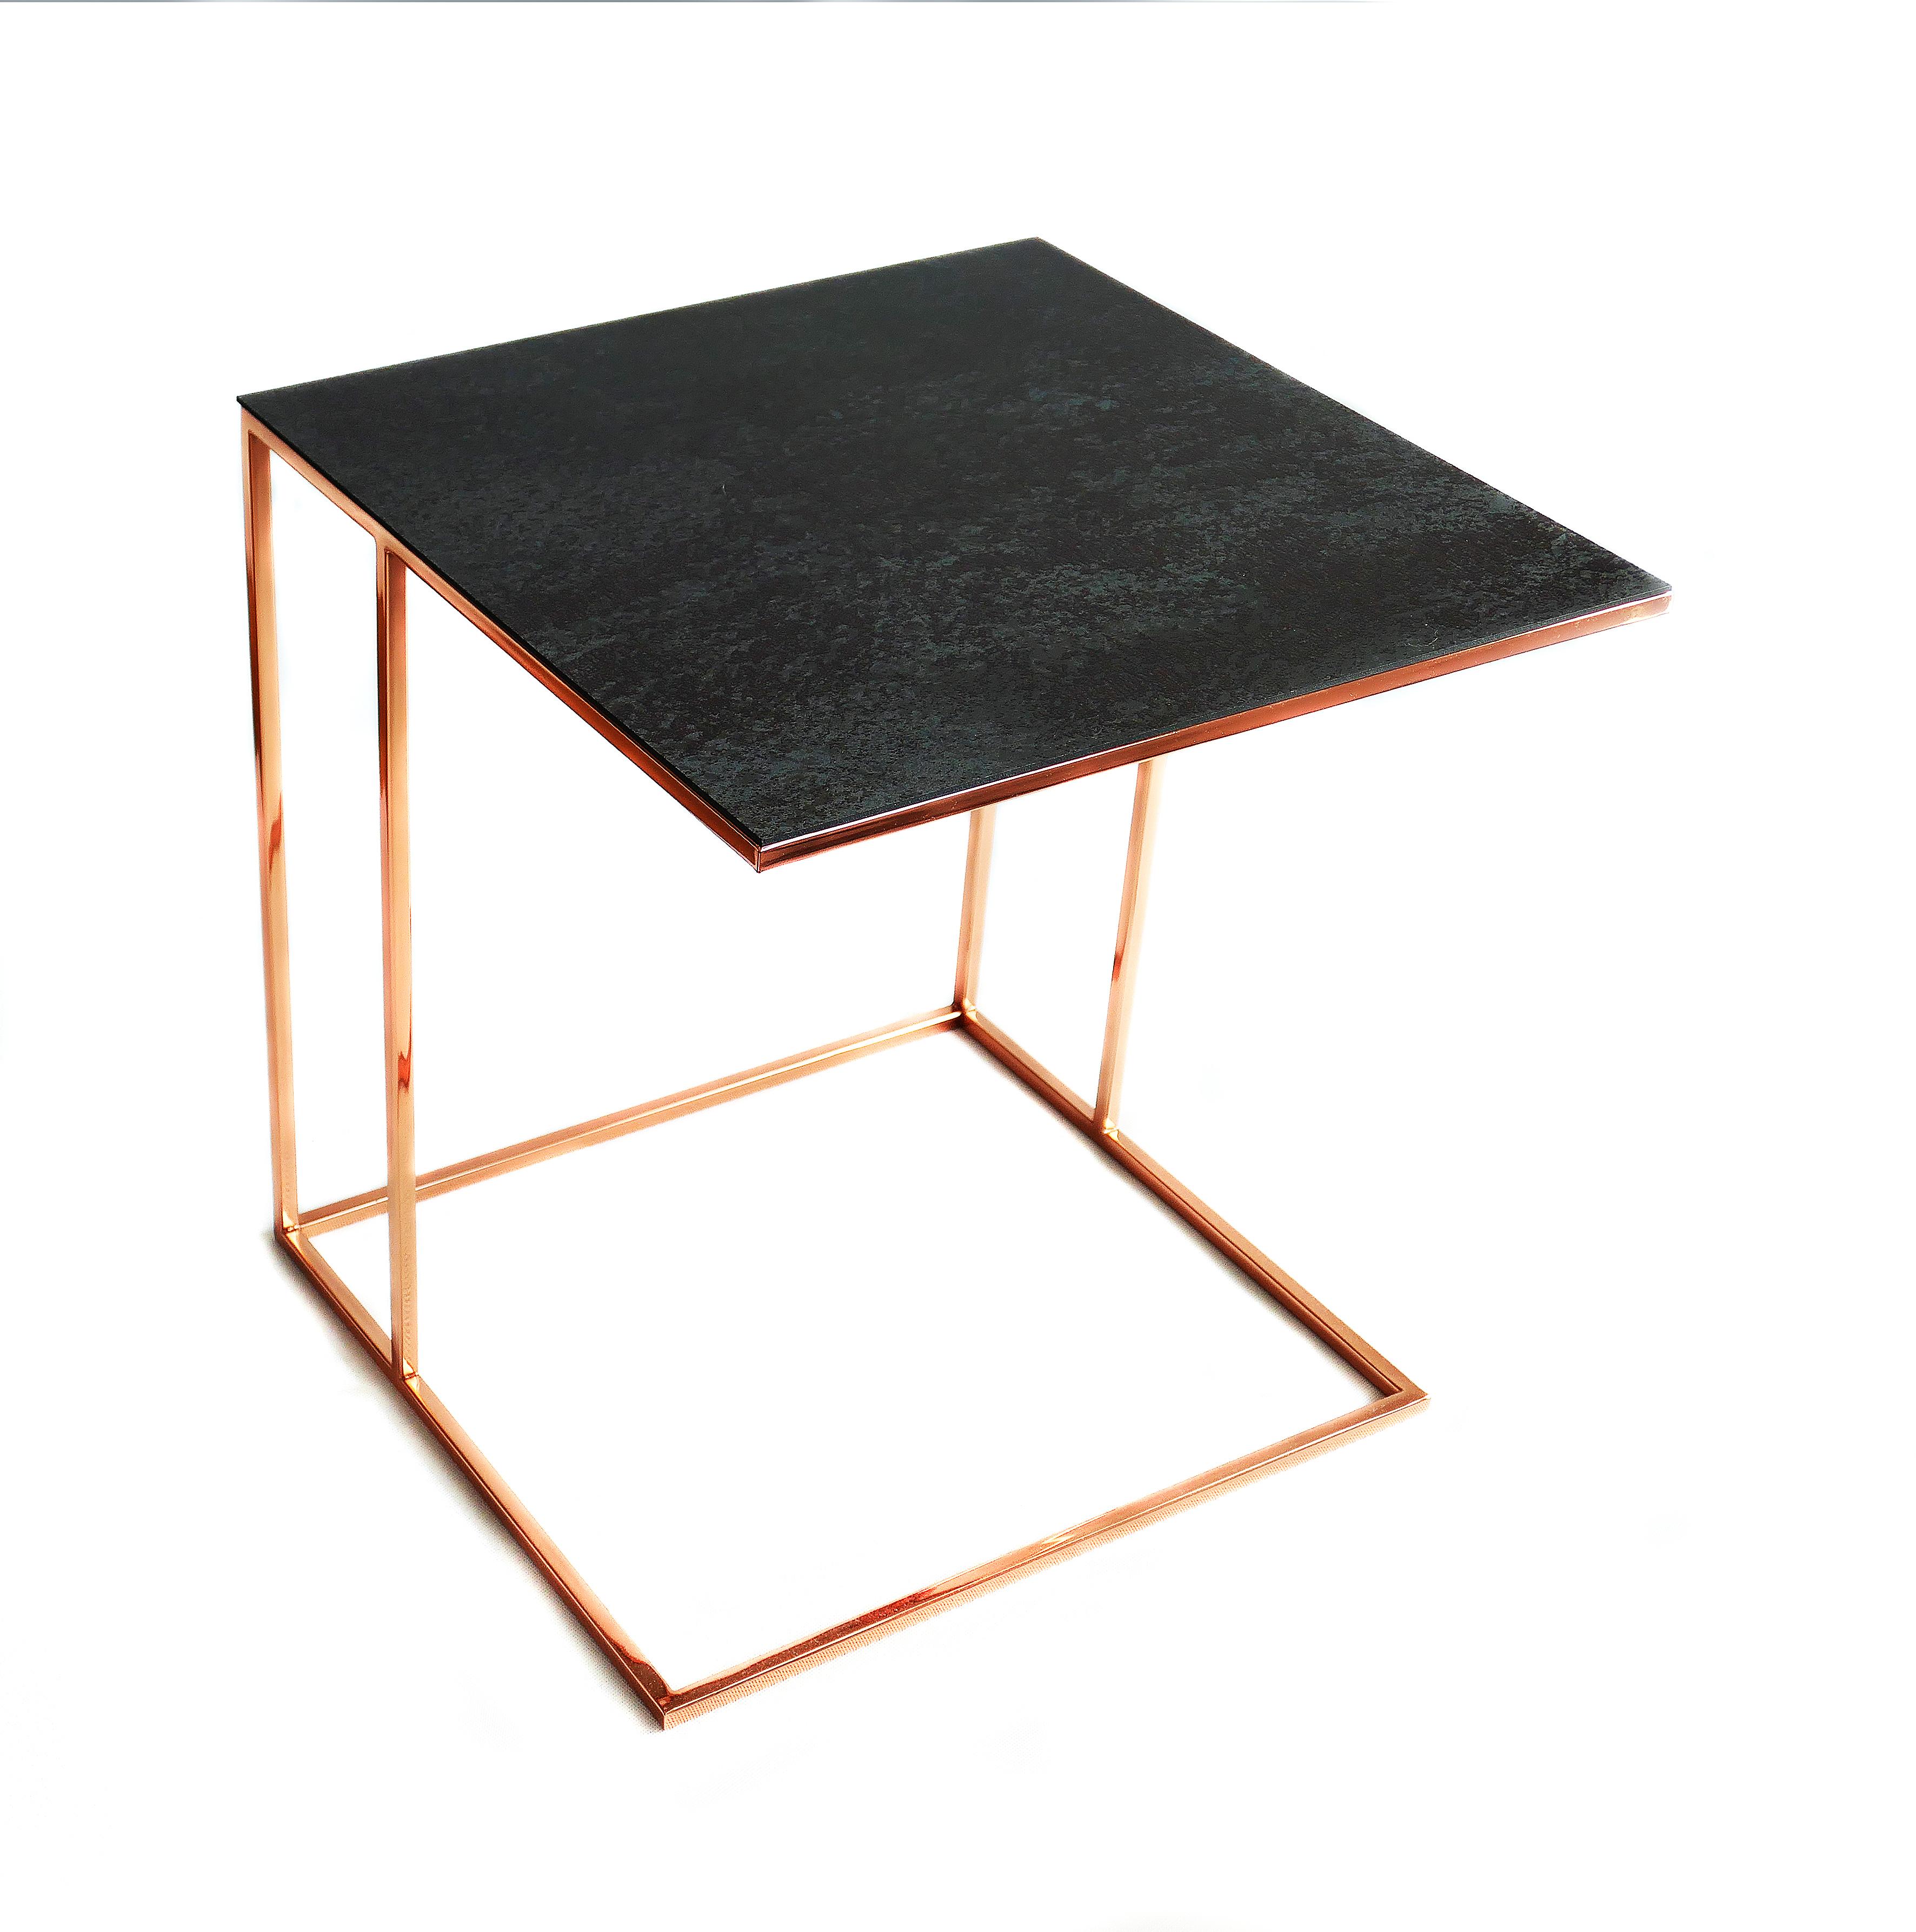 Stolik nadstawka REA furniture MURANO – rama RAME/ blat Laminam OXIDE NERO – wymiary 50/50/53